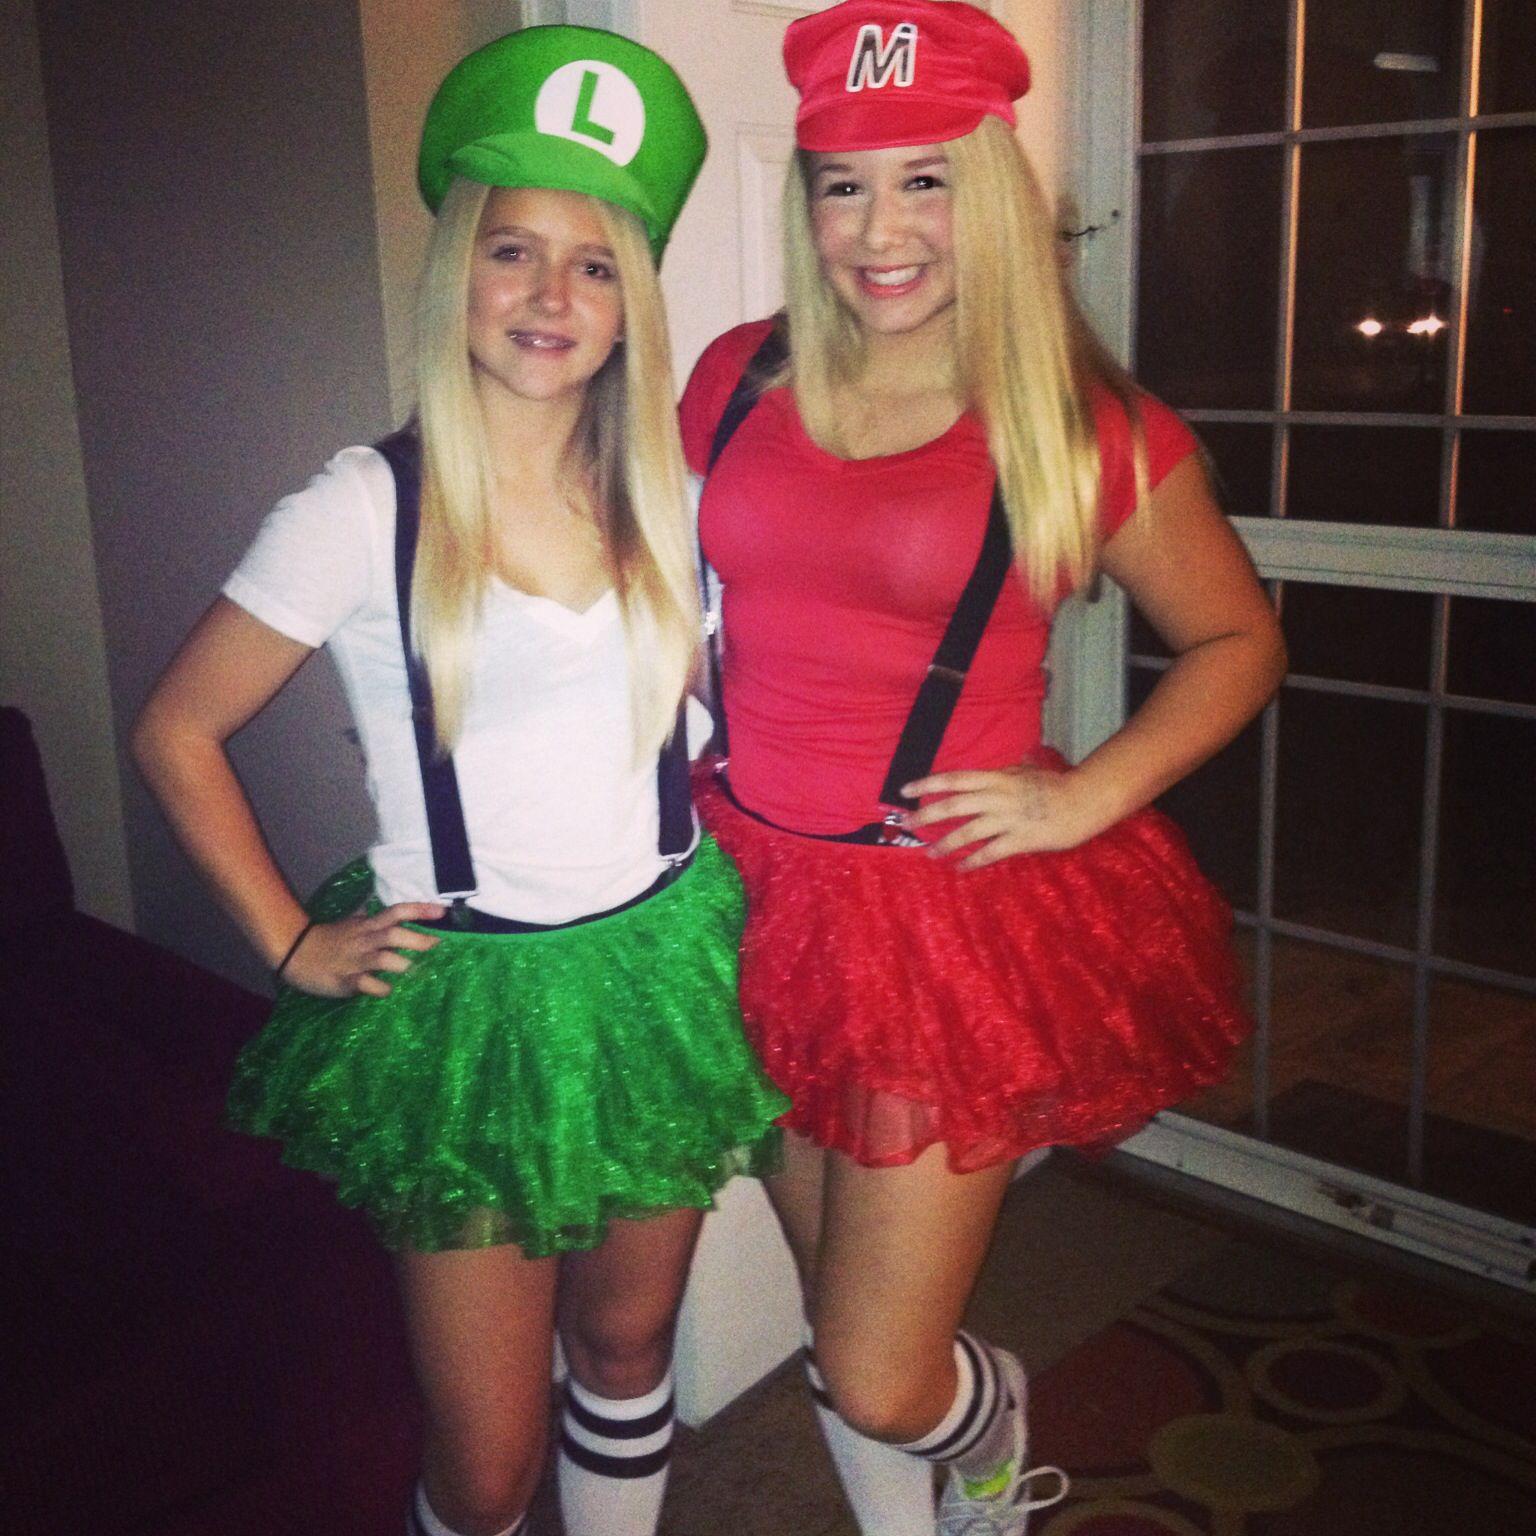 mario and luigi halloween costumes - Girl Mario And Luigi Halloween Costumes